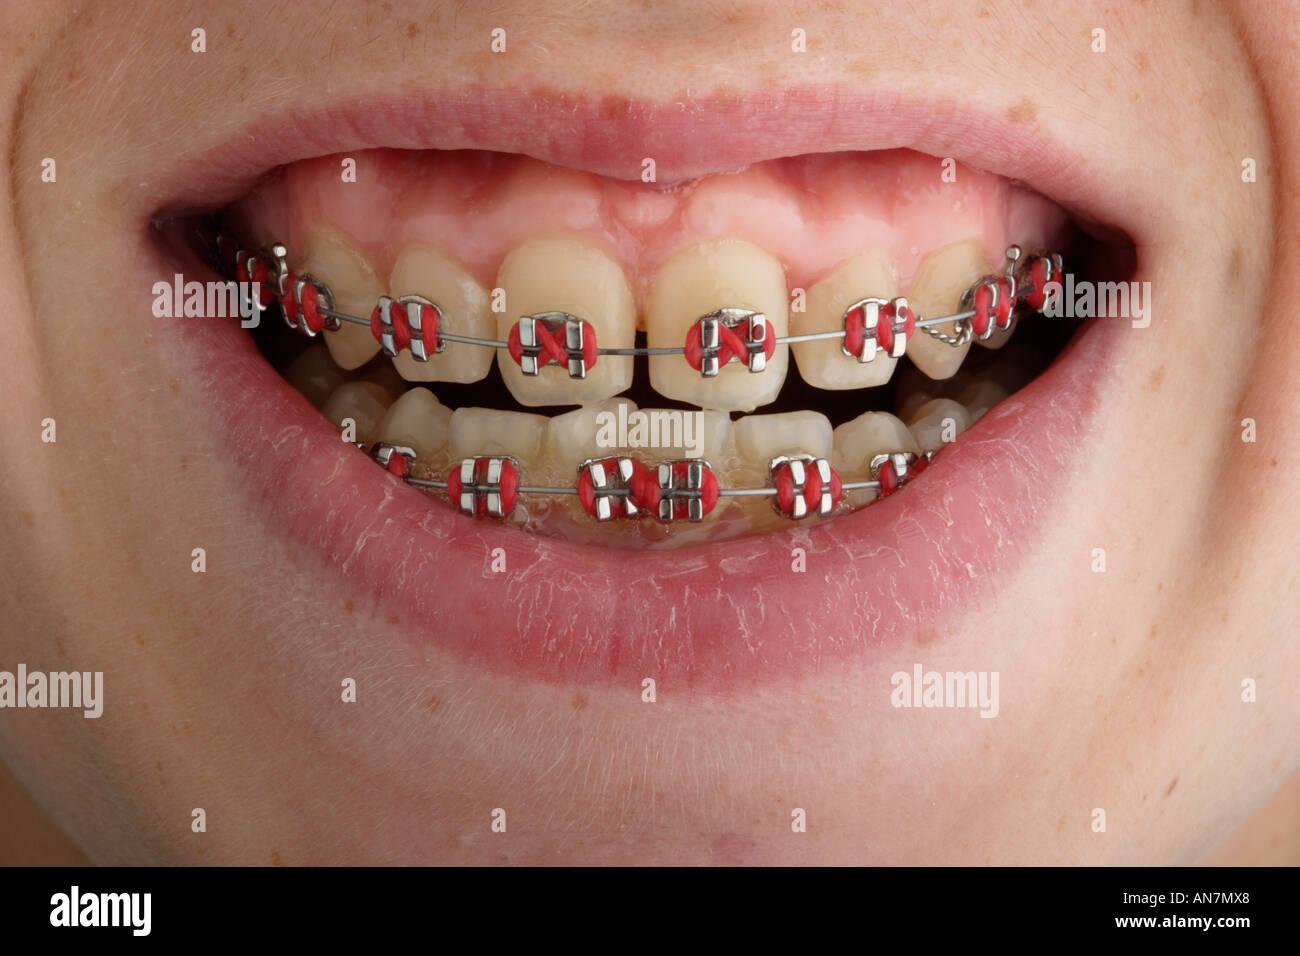 Orthodontiste Stock Photos & Orthodontiste Stock Images - Alamy